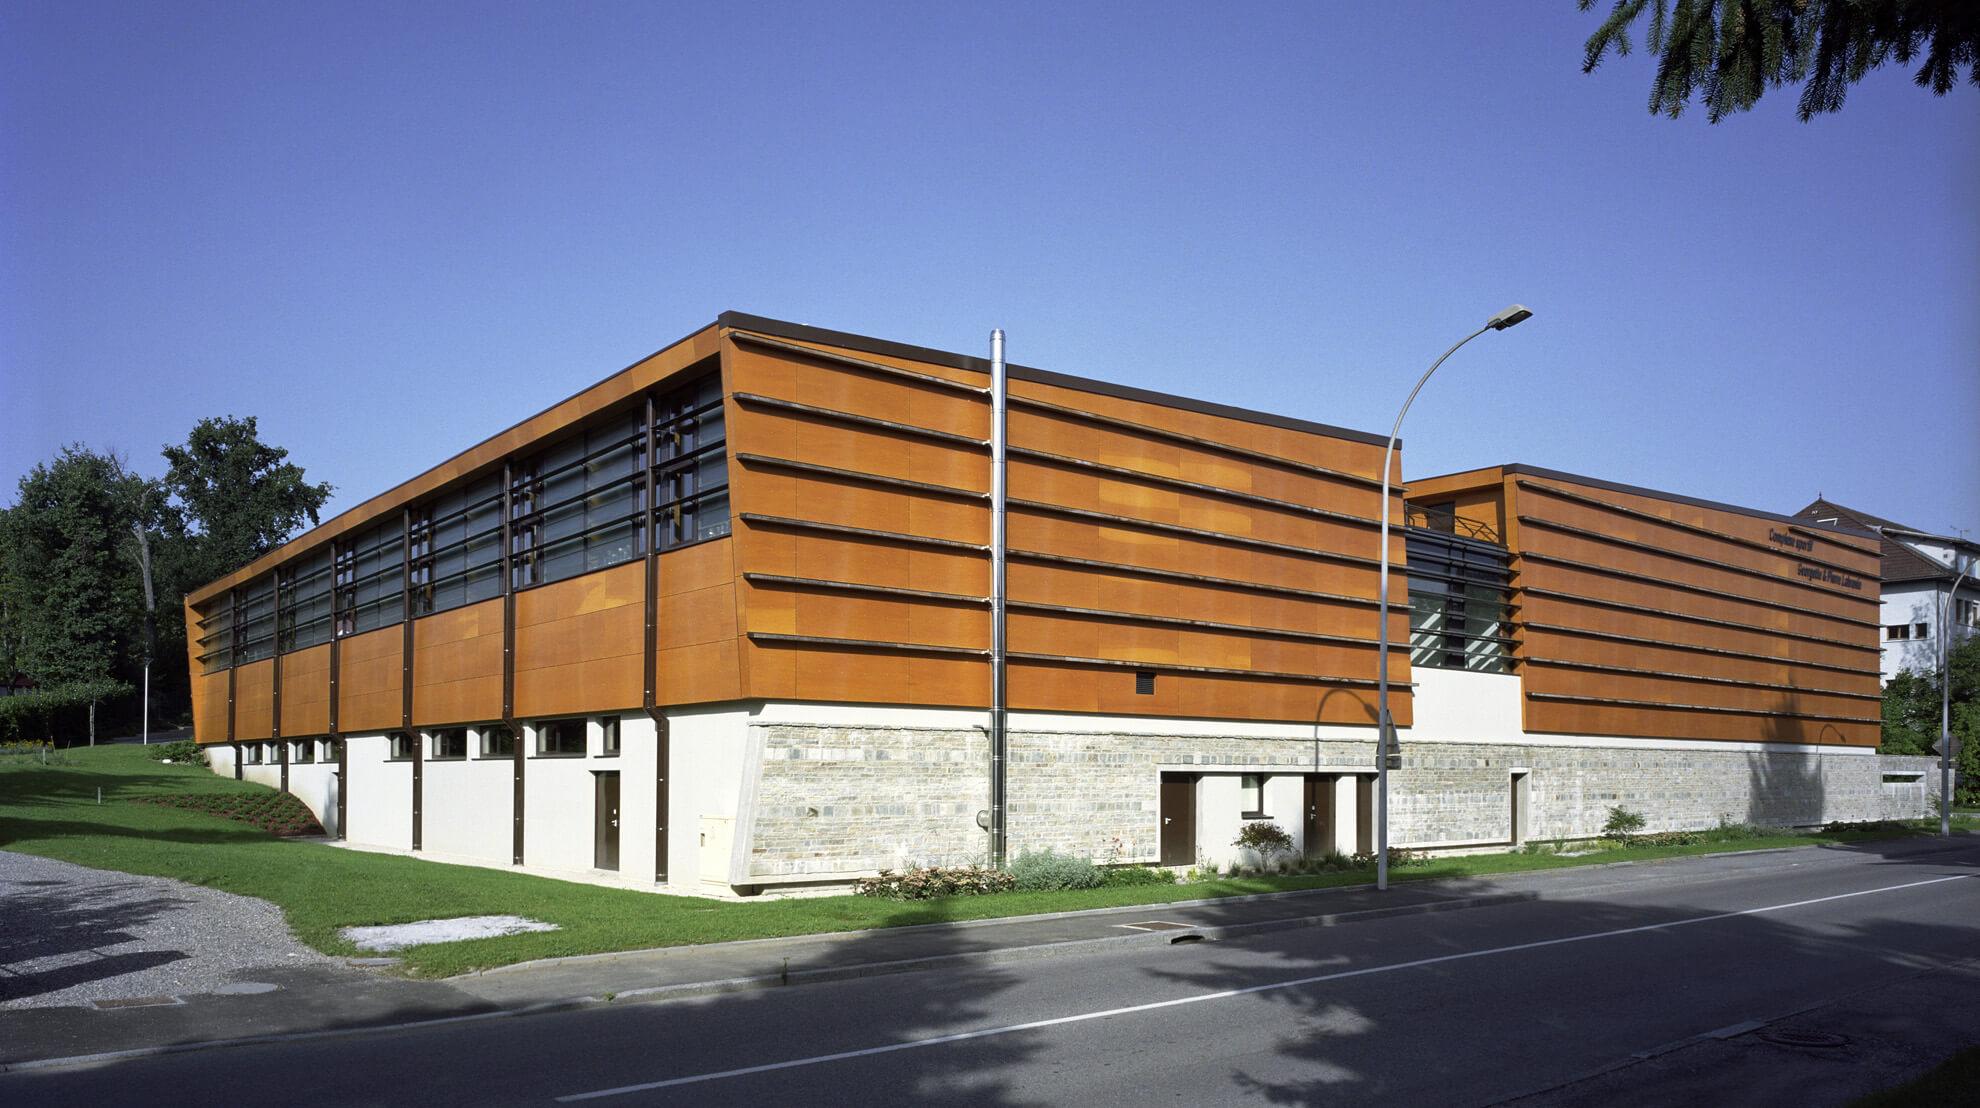 Complexe sportif La Roche sur Foron